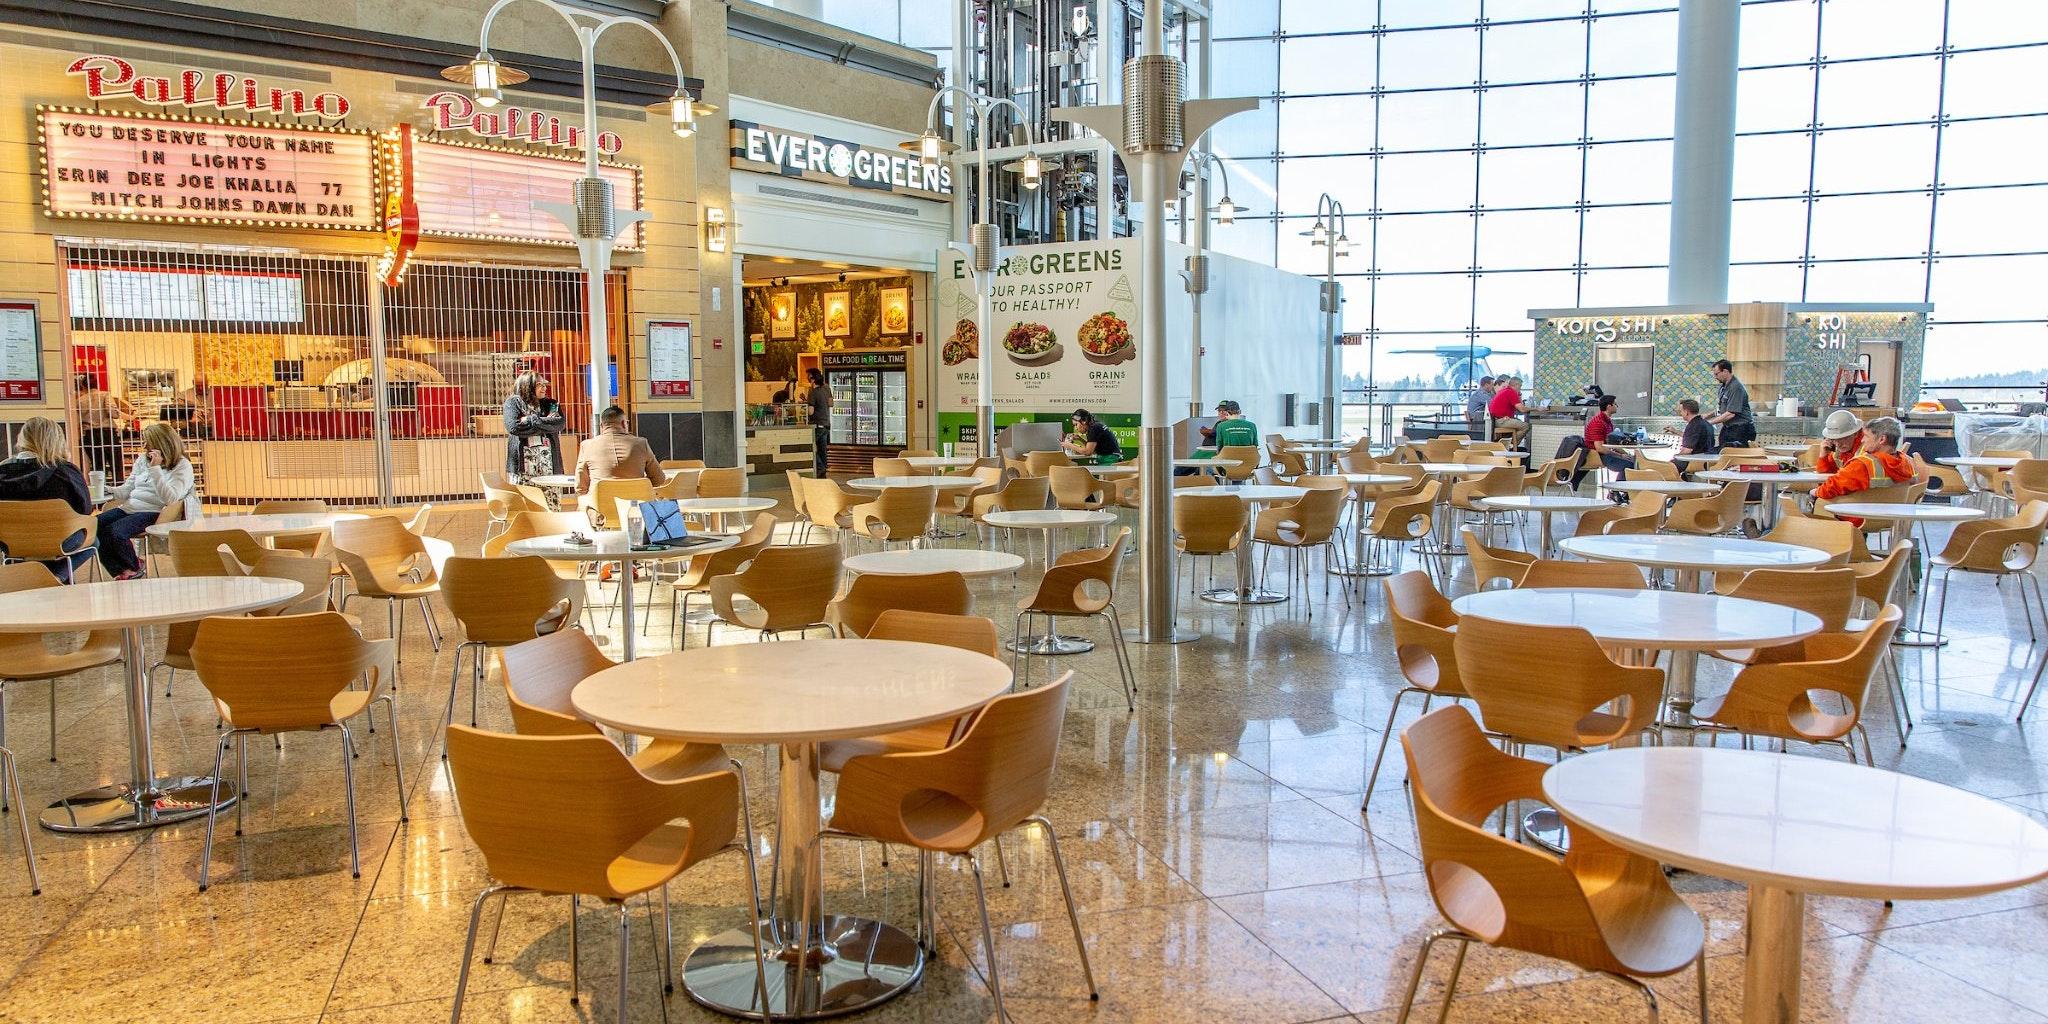 Central Terminal at SEA Airport